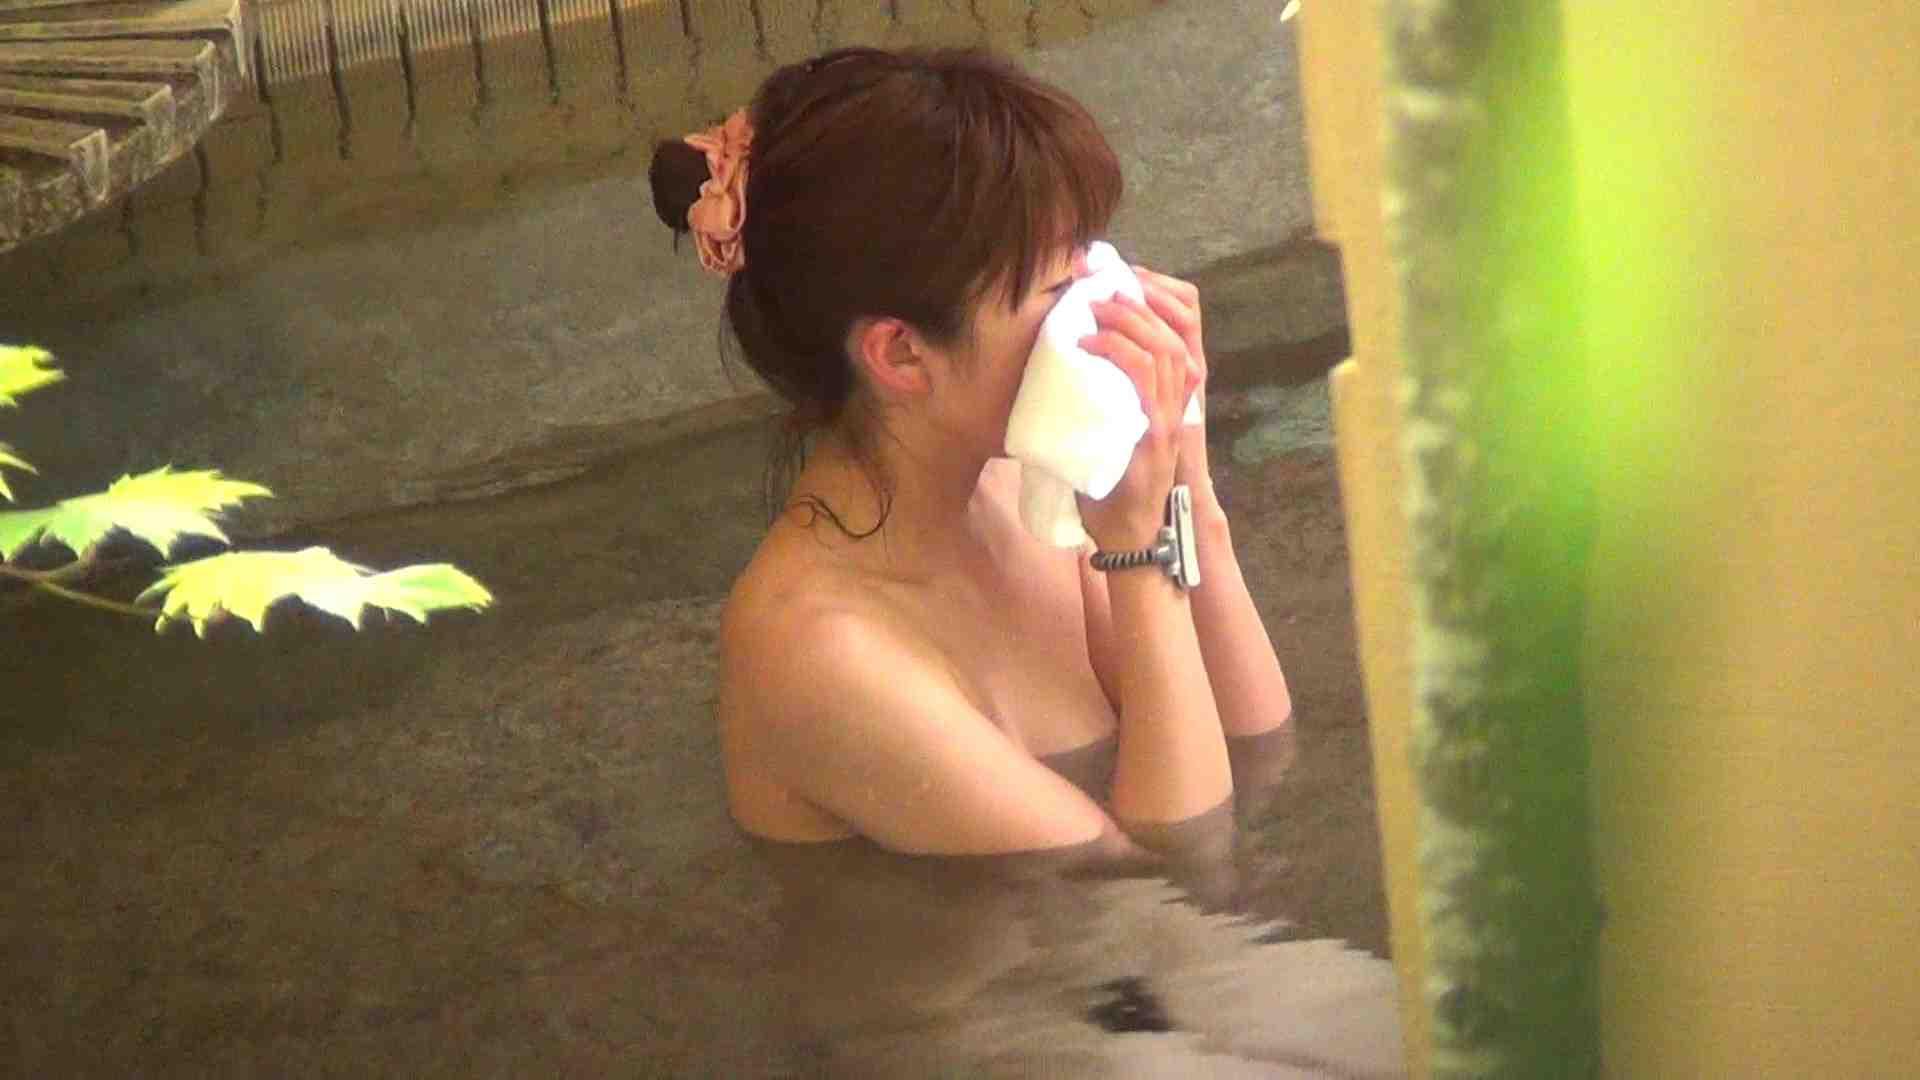 Aquaな露天風呂Vol.251 露天   HなOL  76pic 36